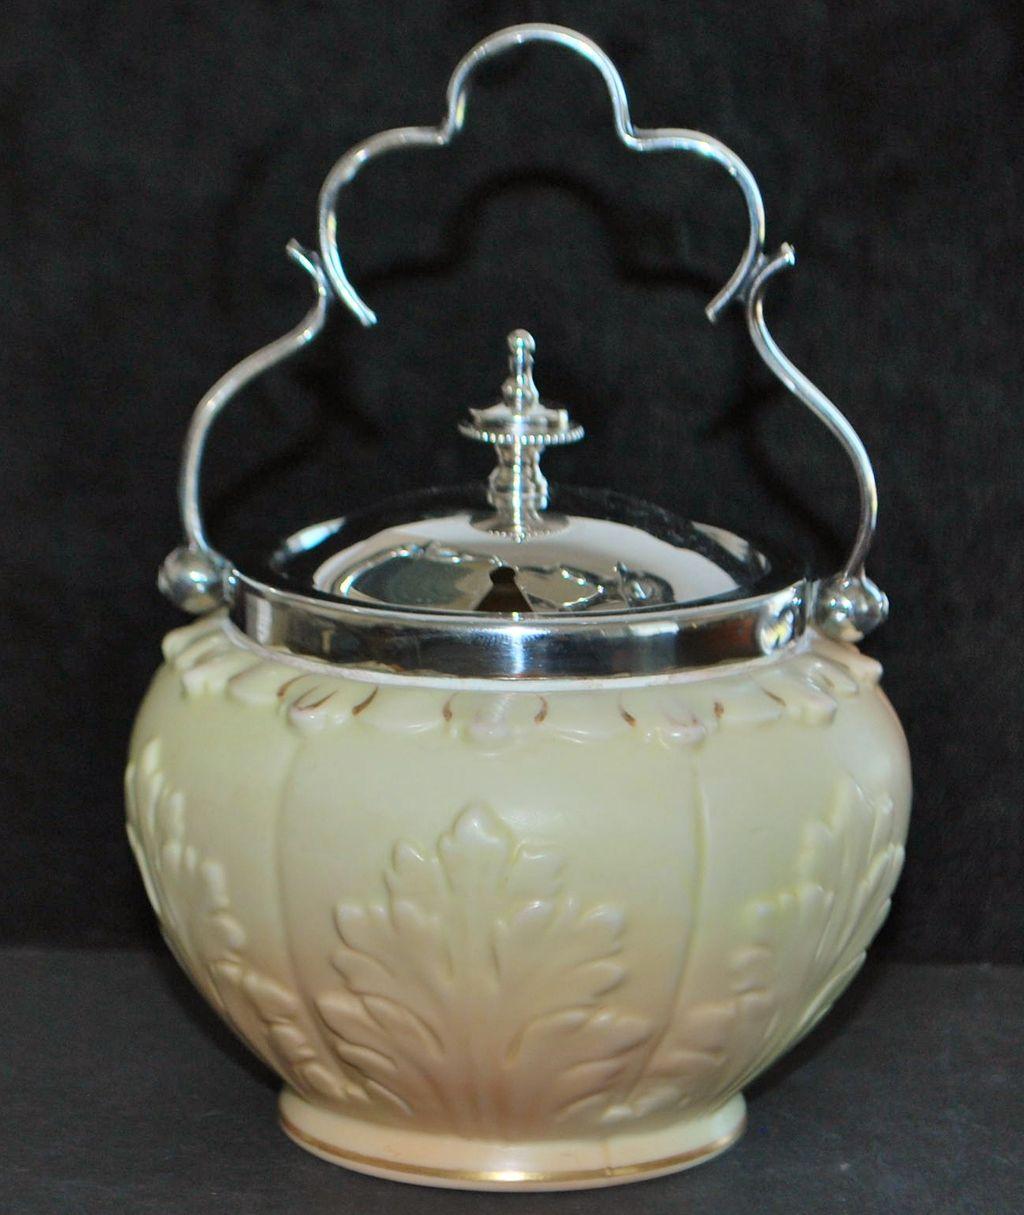 English Worcester Locke & Co. Preserve Pot, c. 1900